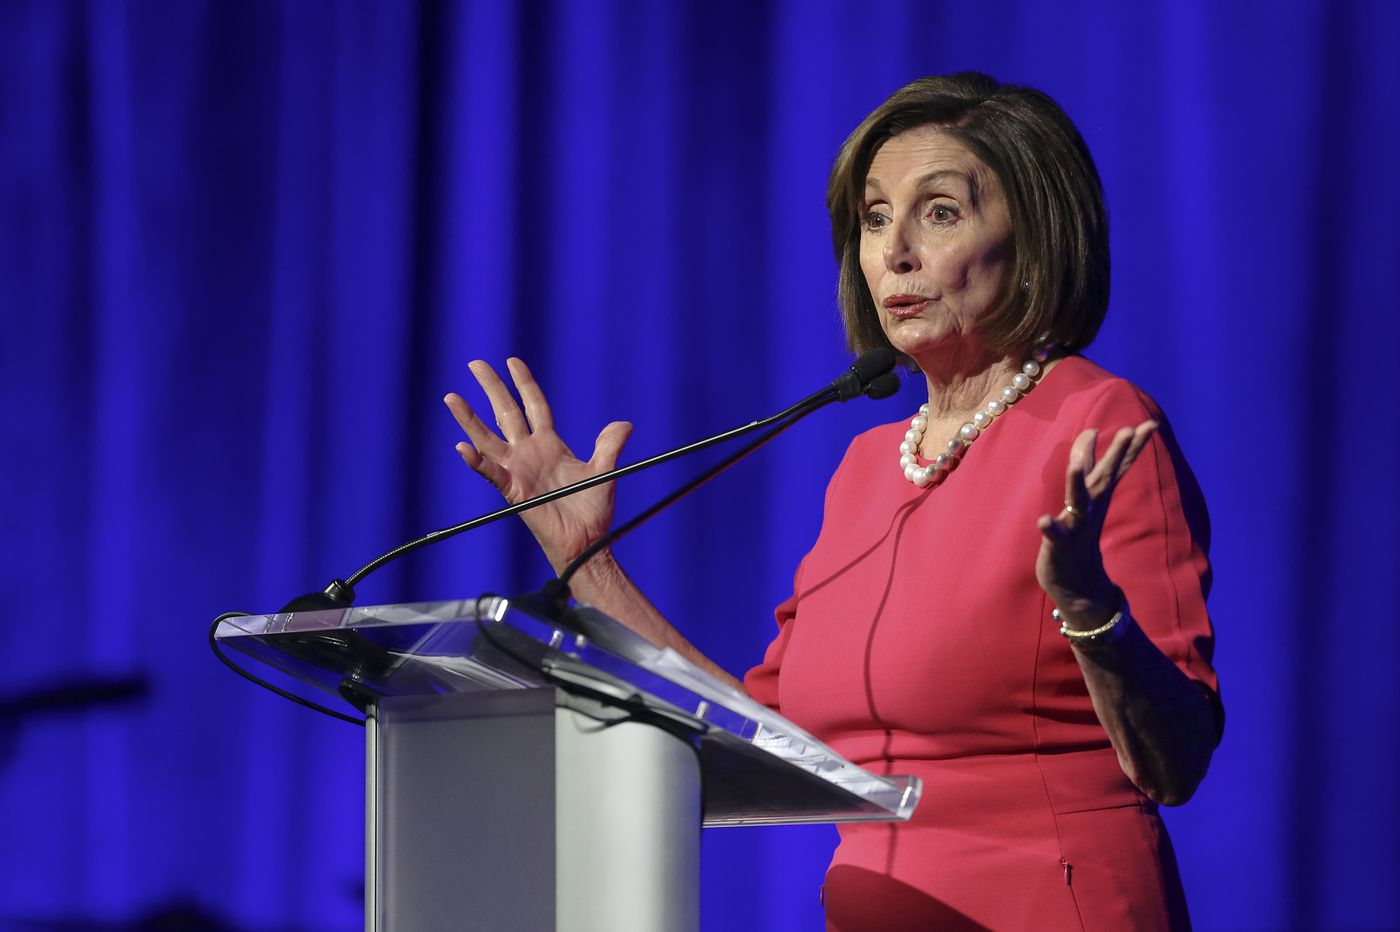 Speaker Nancy Pelosi, in Philadelphia, says Congress had 'no choice' but to pursue impeachment inquiry